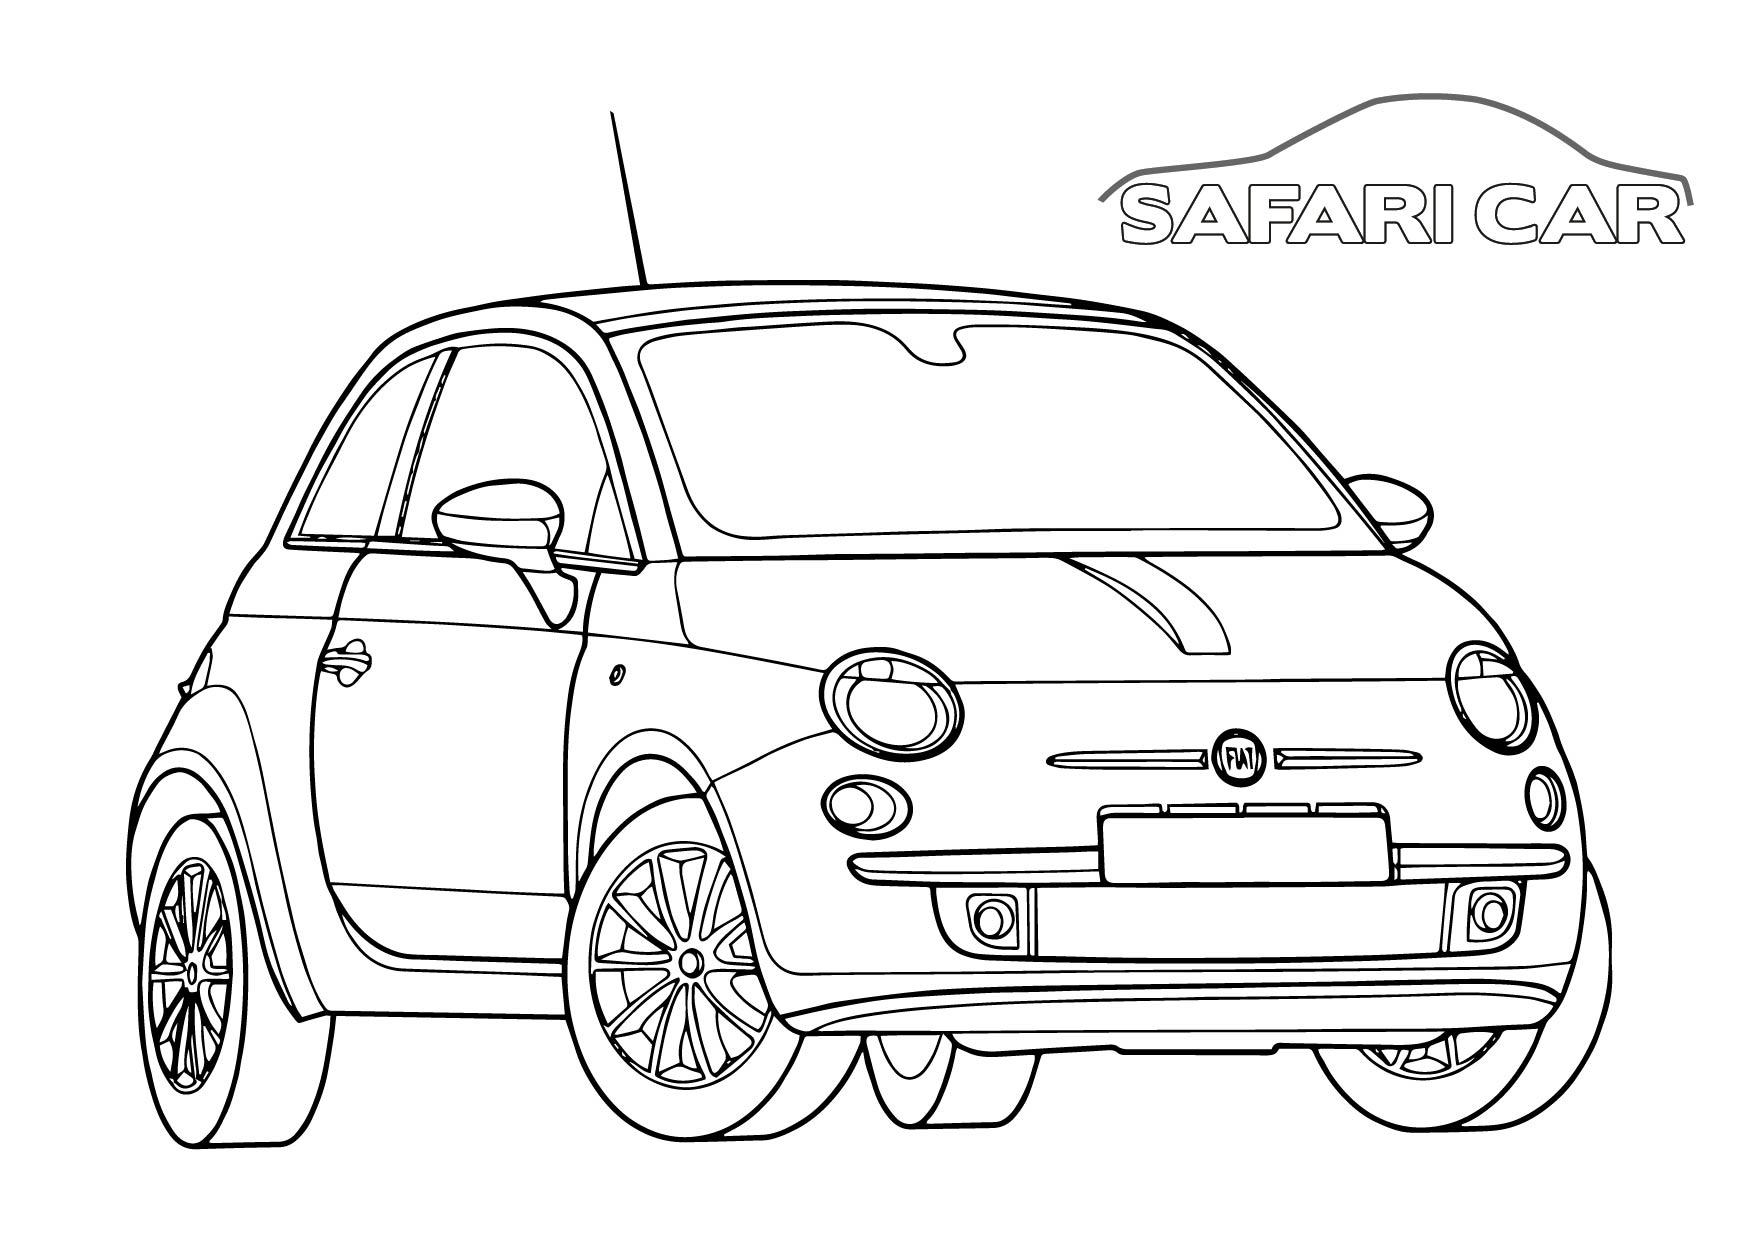 fiat500safaricar 01